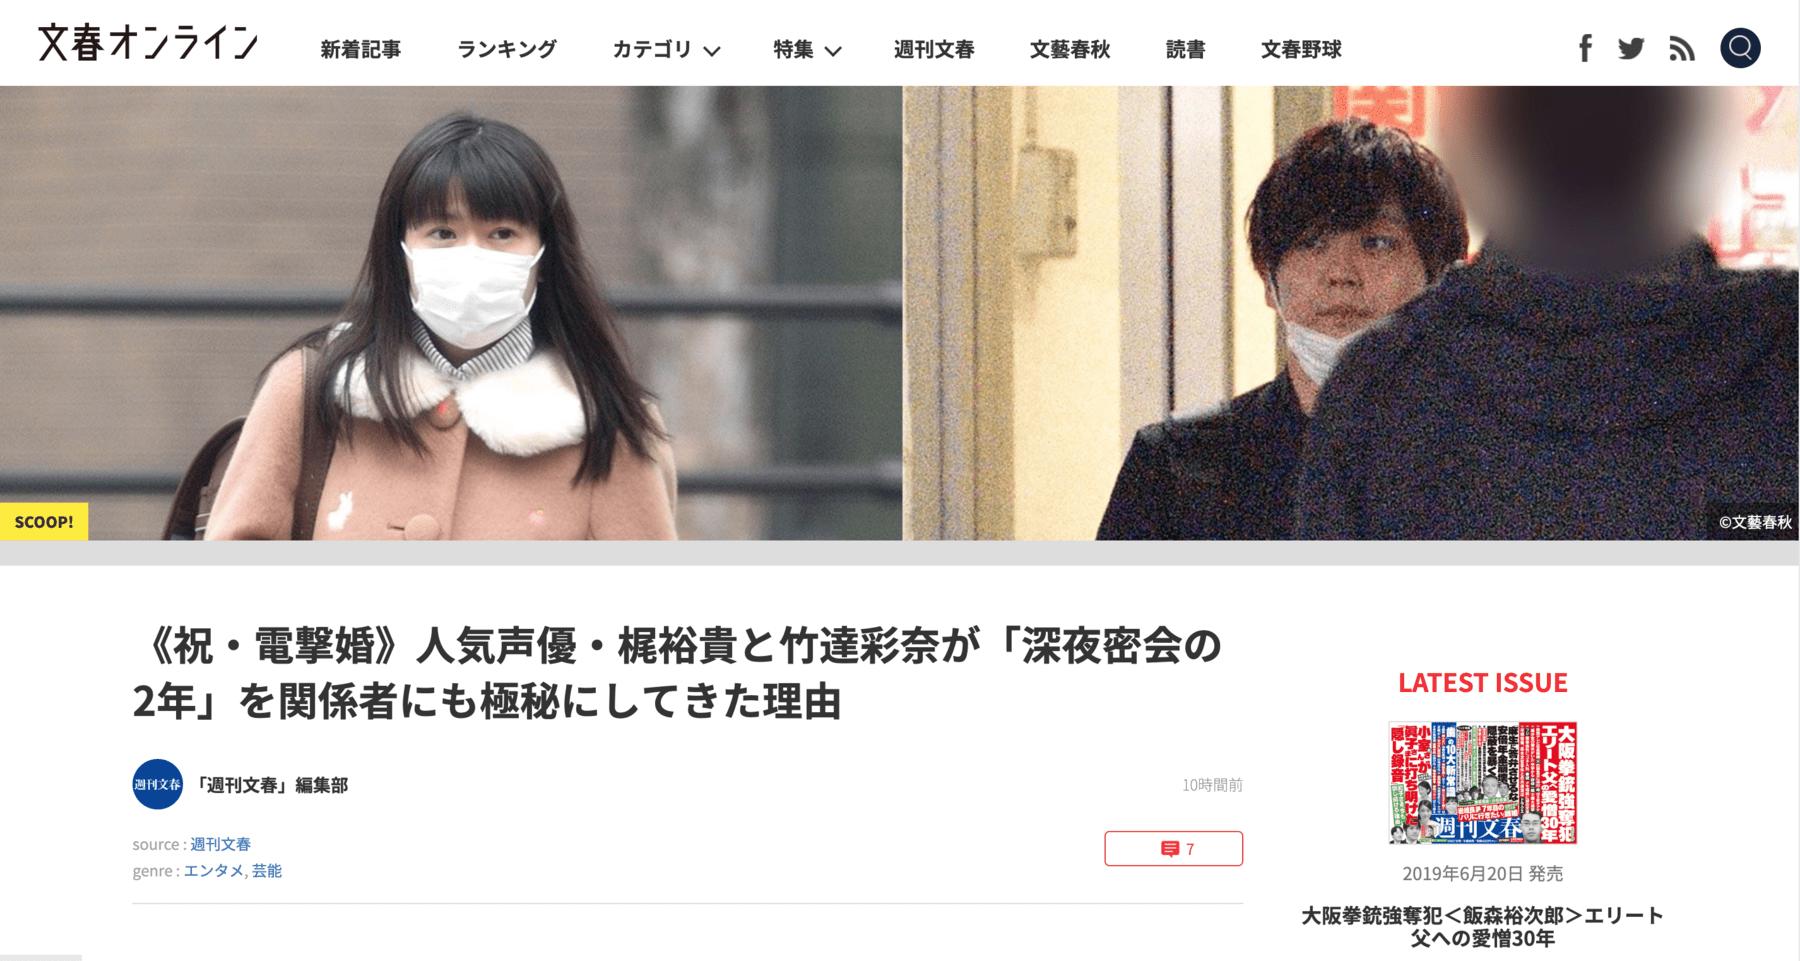 https://bunshun.jp/articles/-/12492